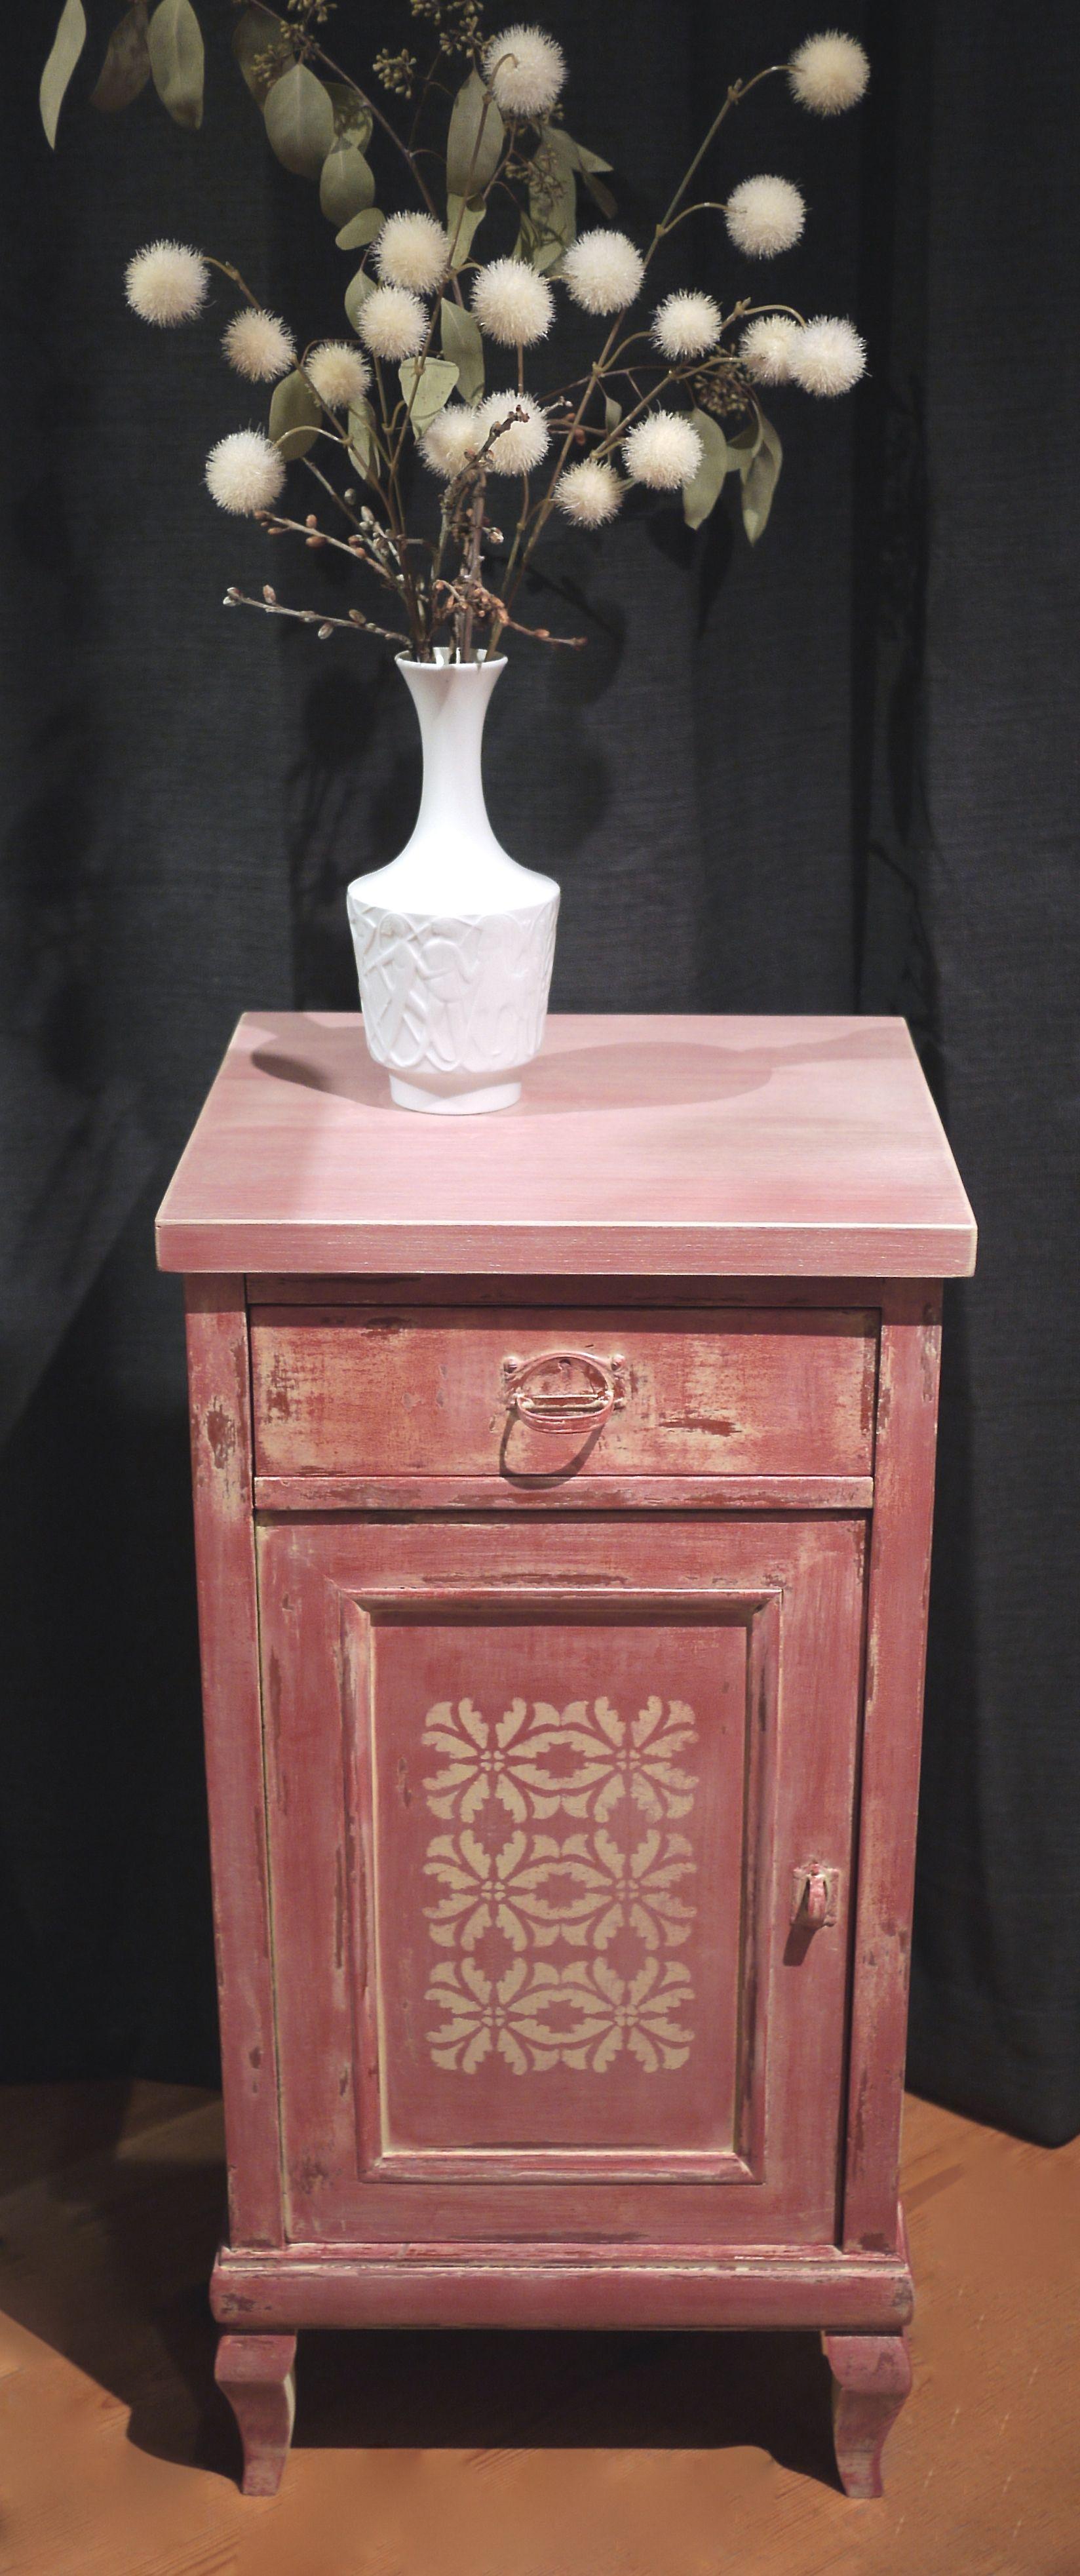 nachtschrank nachttisch keidefarbe neugestaltung pimento antik kreidefarbe chalk paint. Black Bedroom Furniture Sets. Home Design Ideas